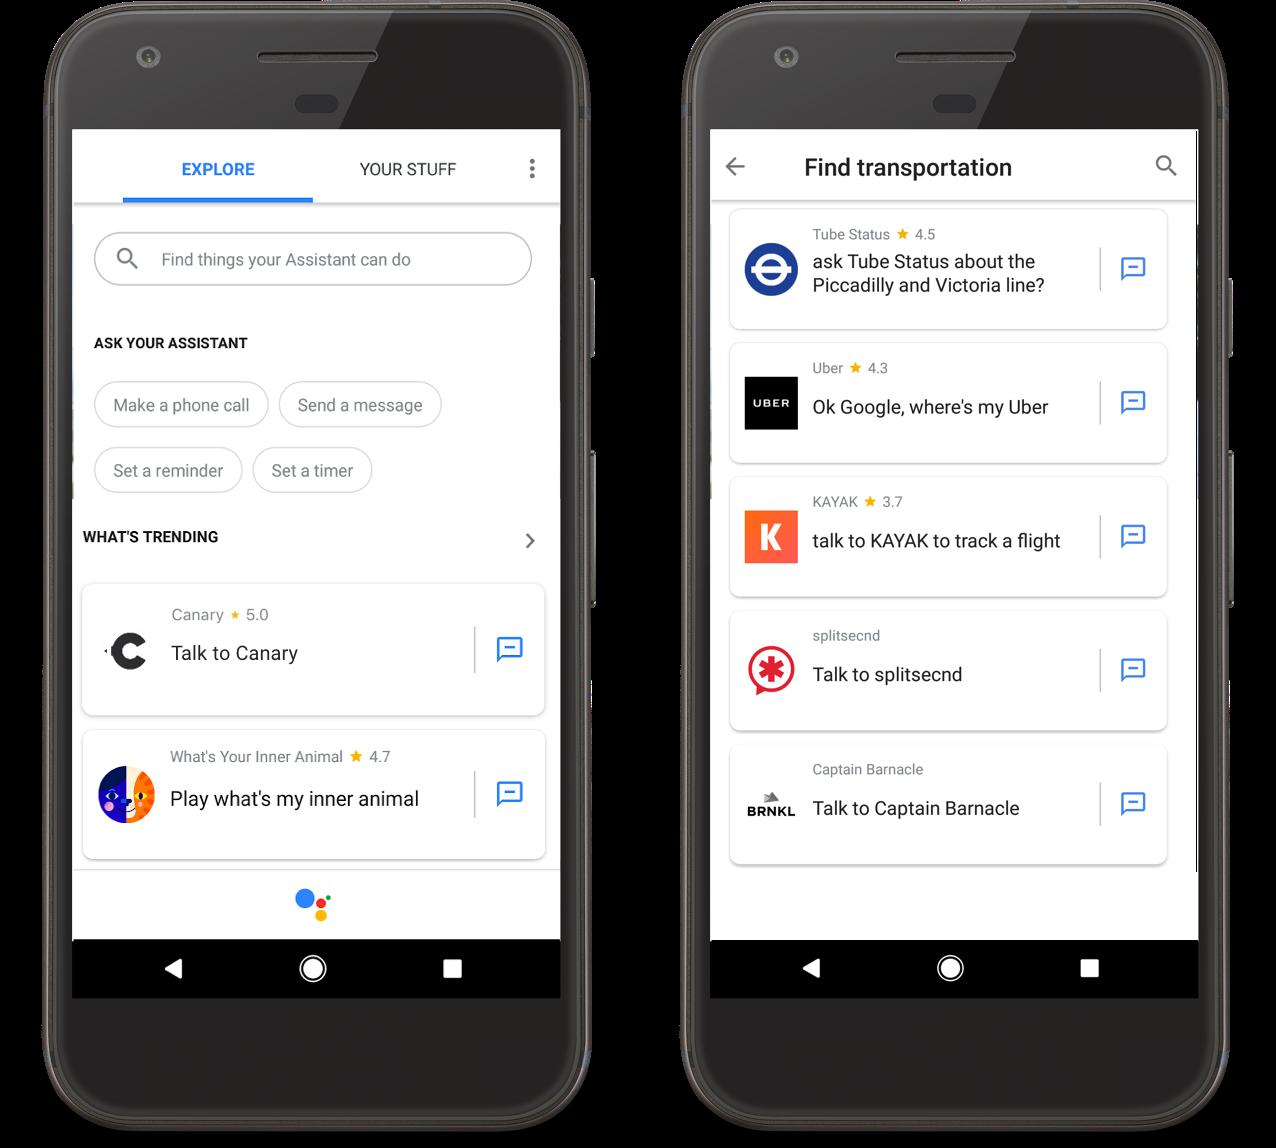 Google Assistant subcategories